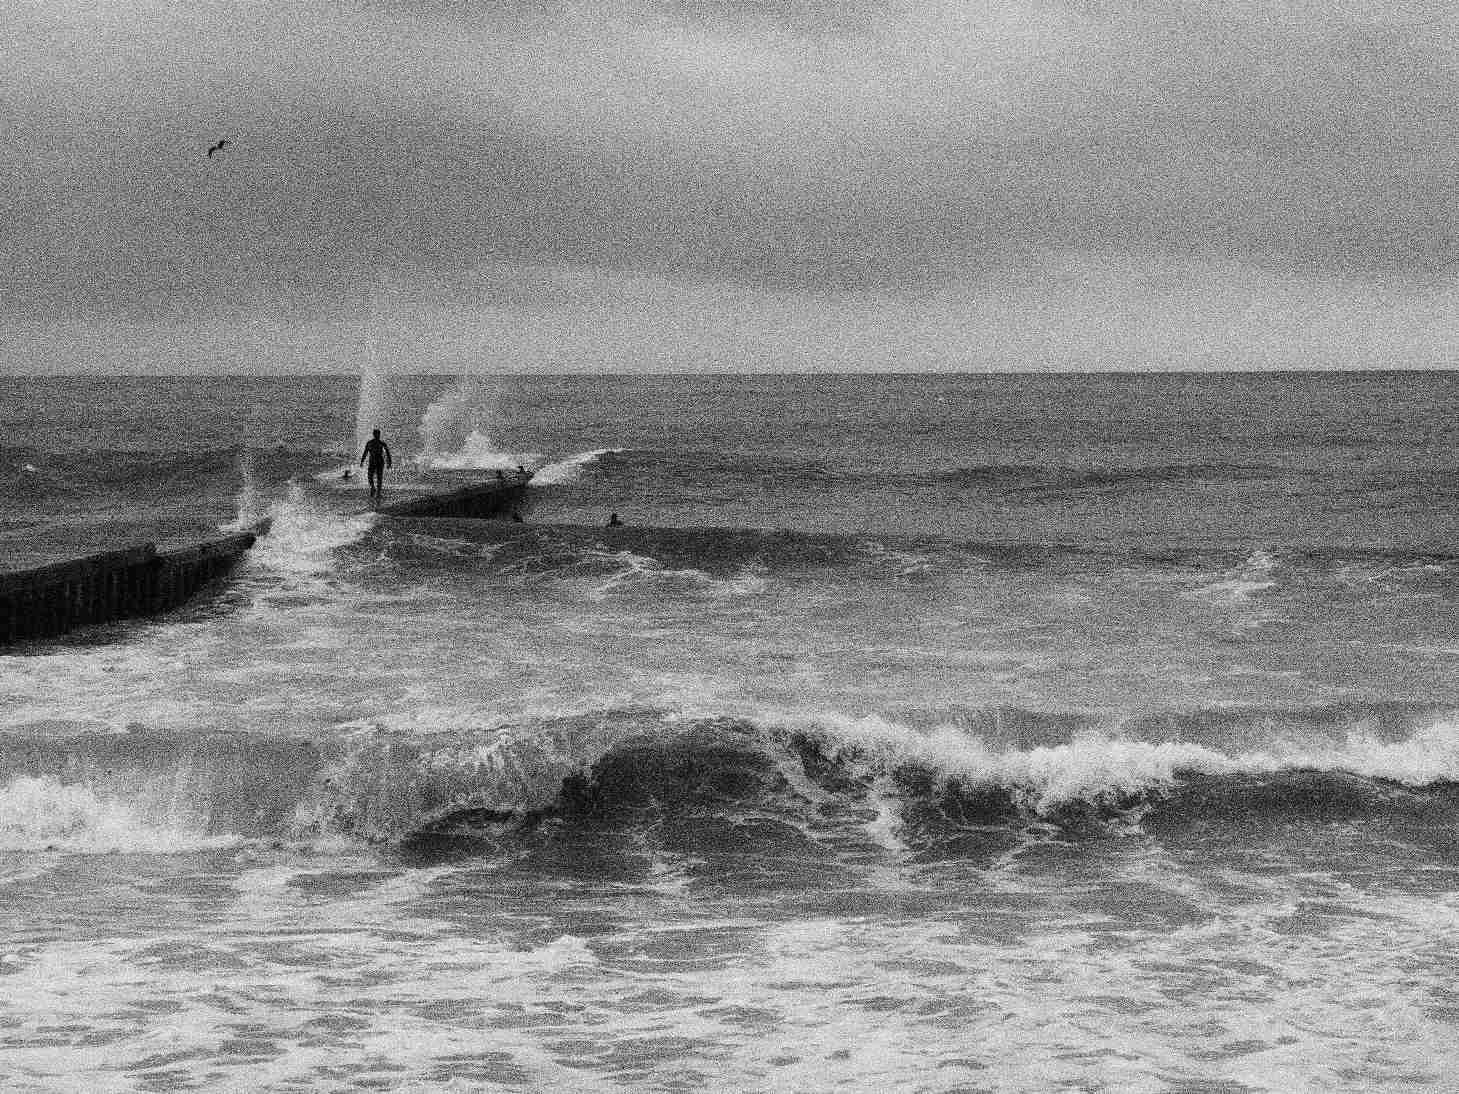 surf_